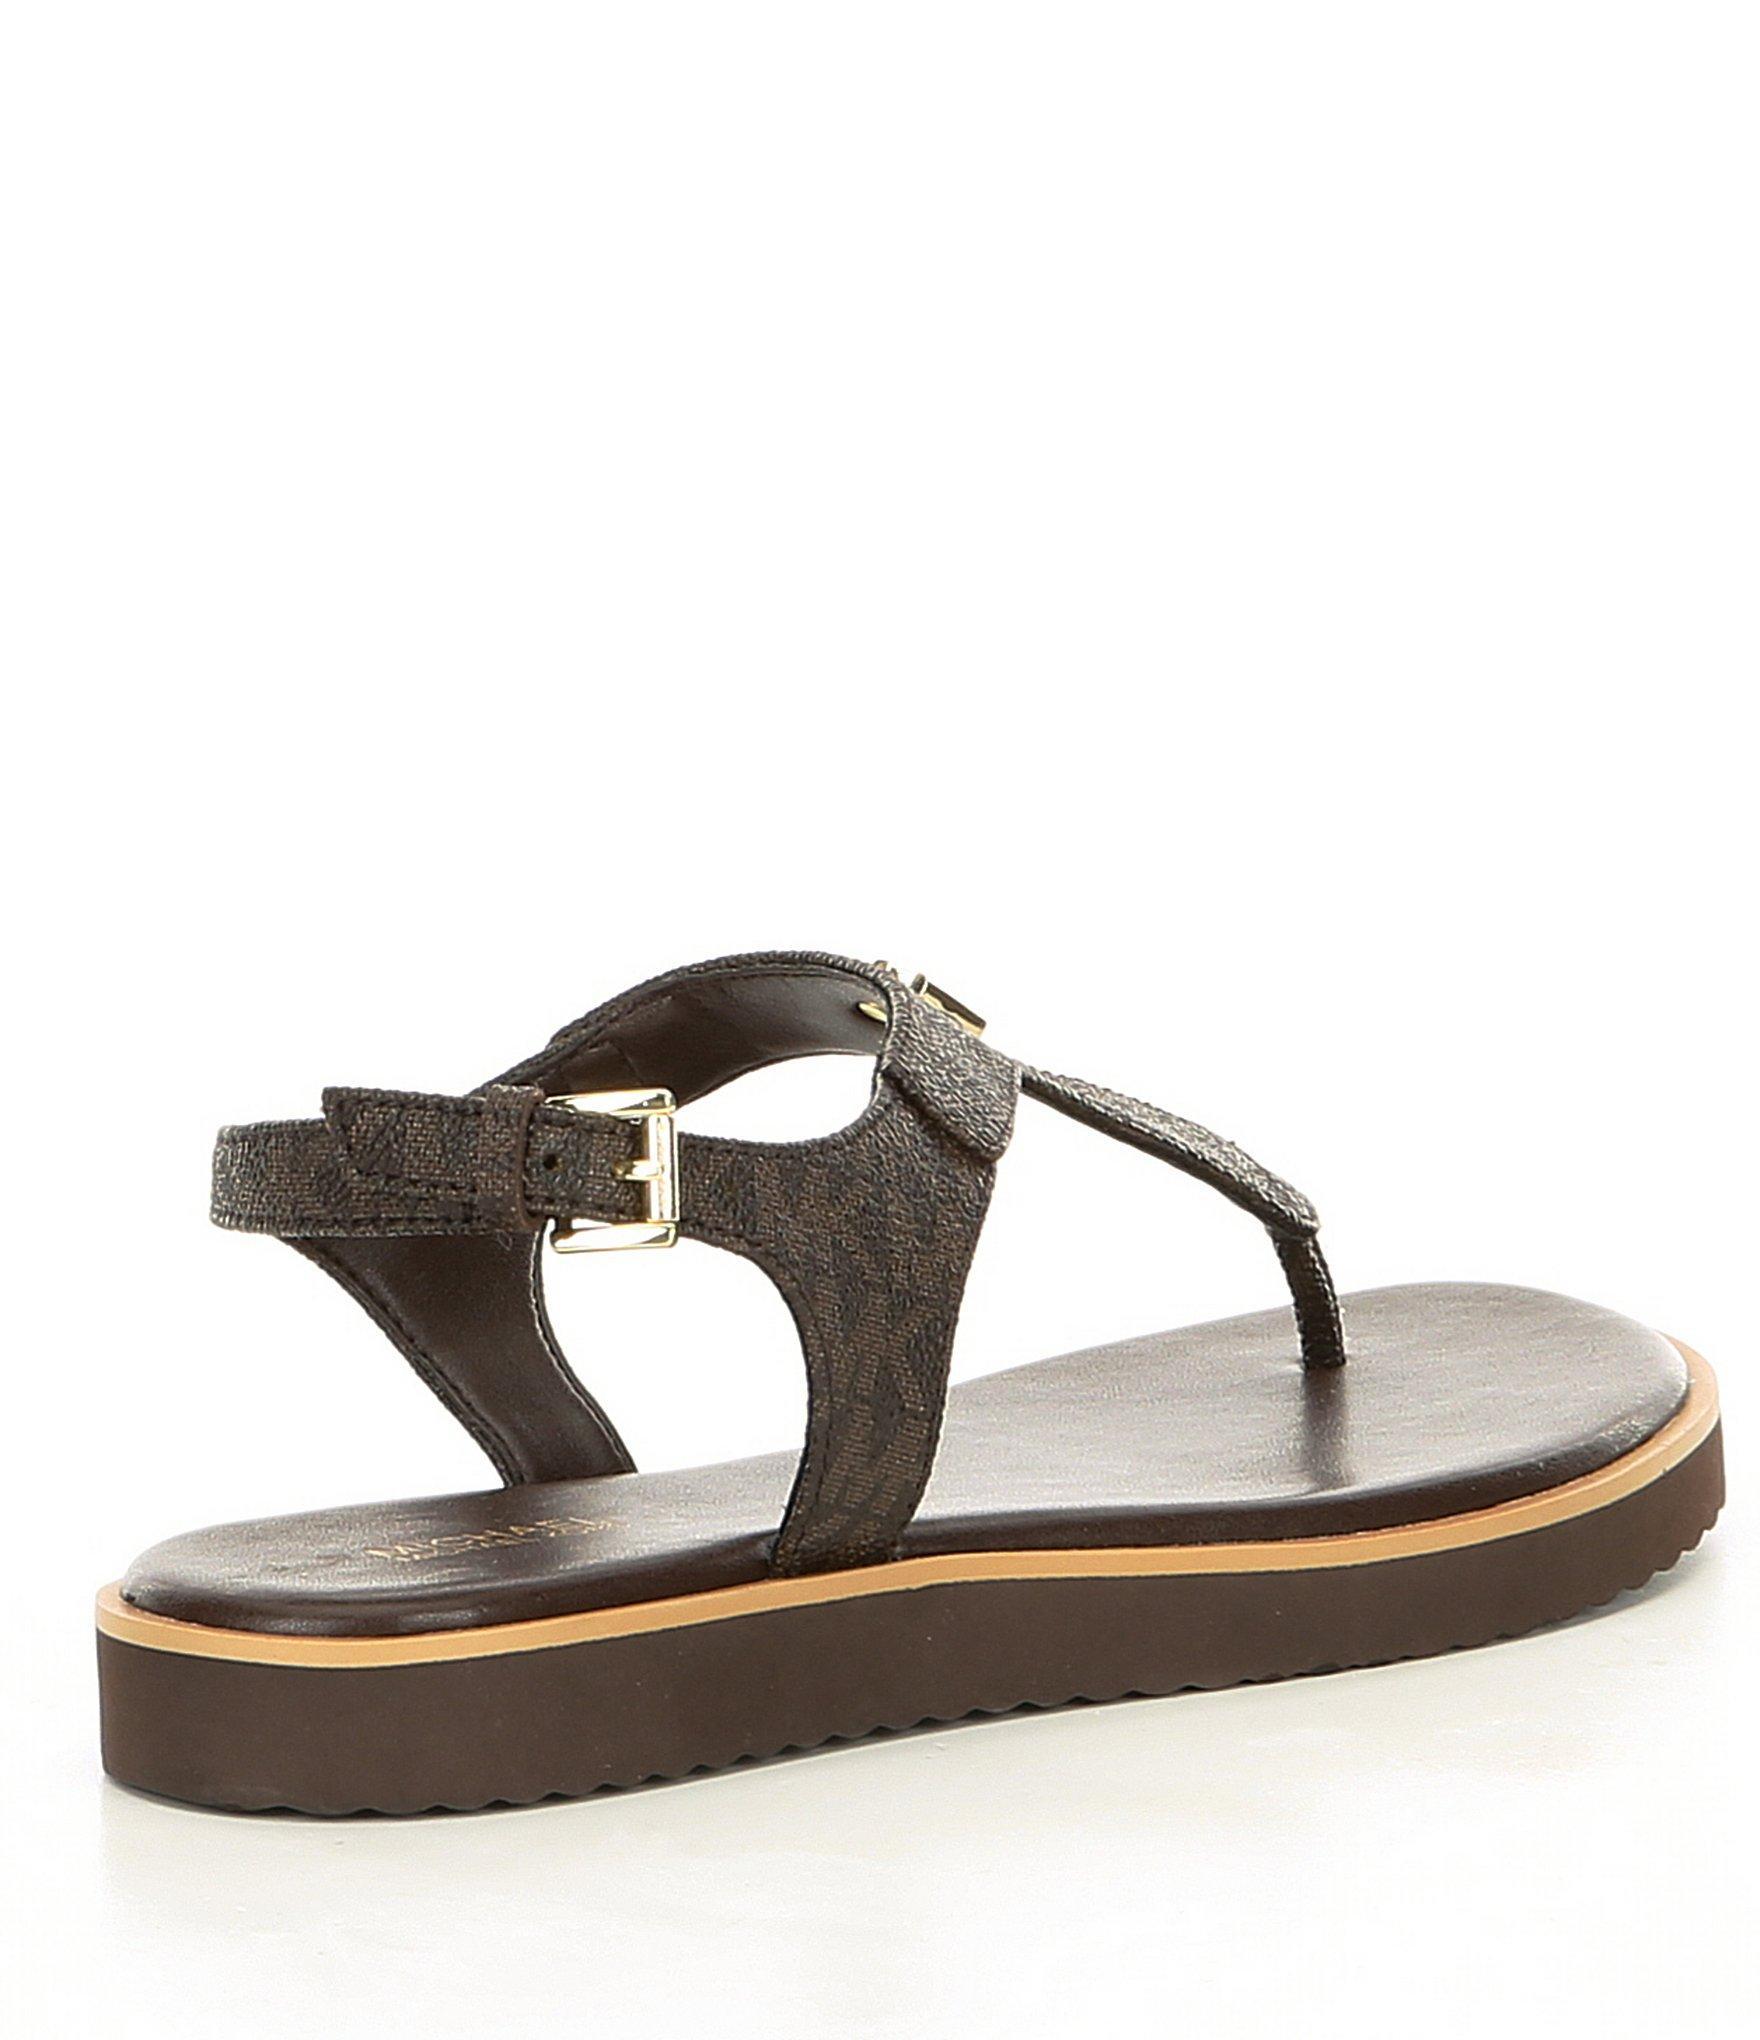 19f7b679d9c6 MICHAEL Michael Kors Brady Thong Sandals in Brown - Lyst